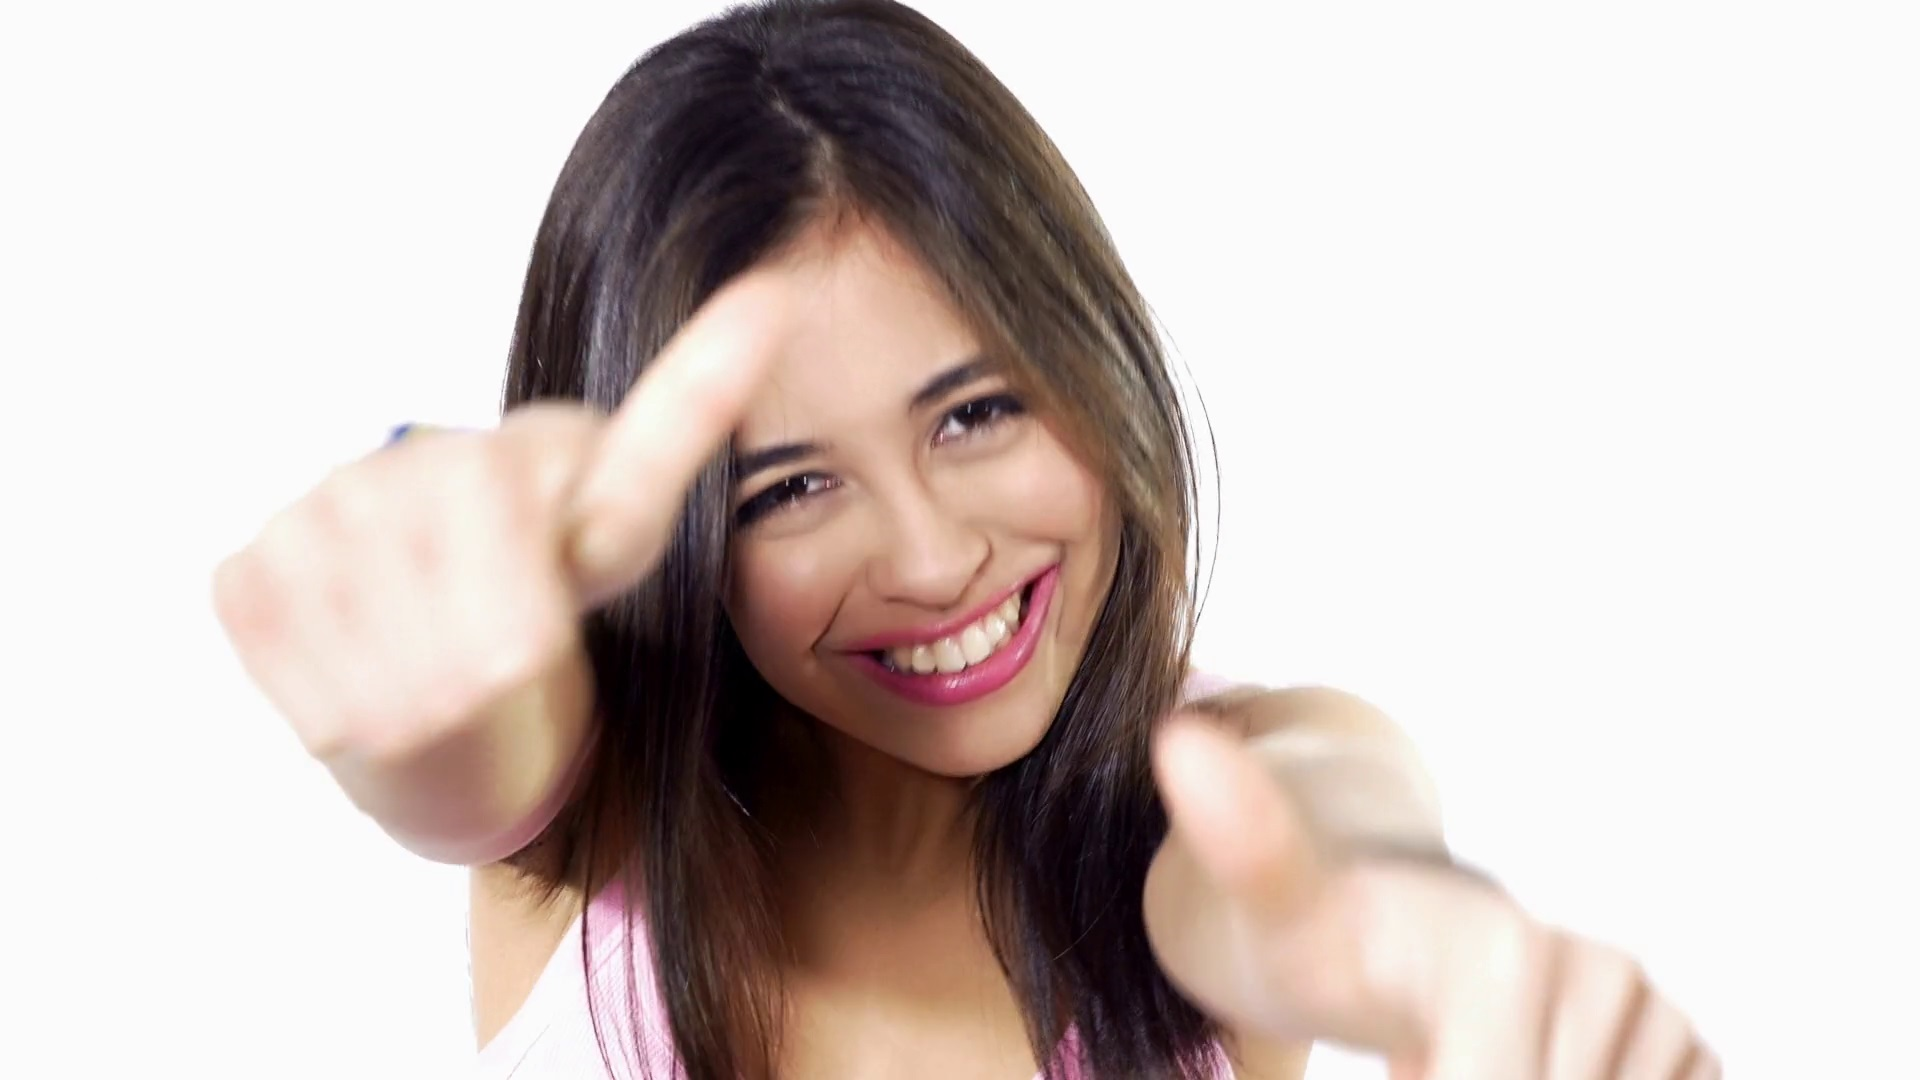 thumbs up woman attitude